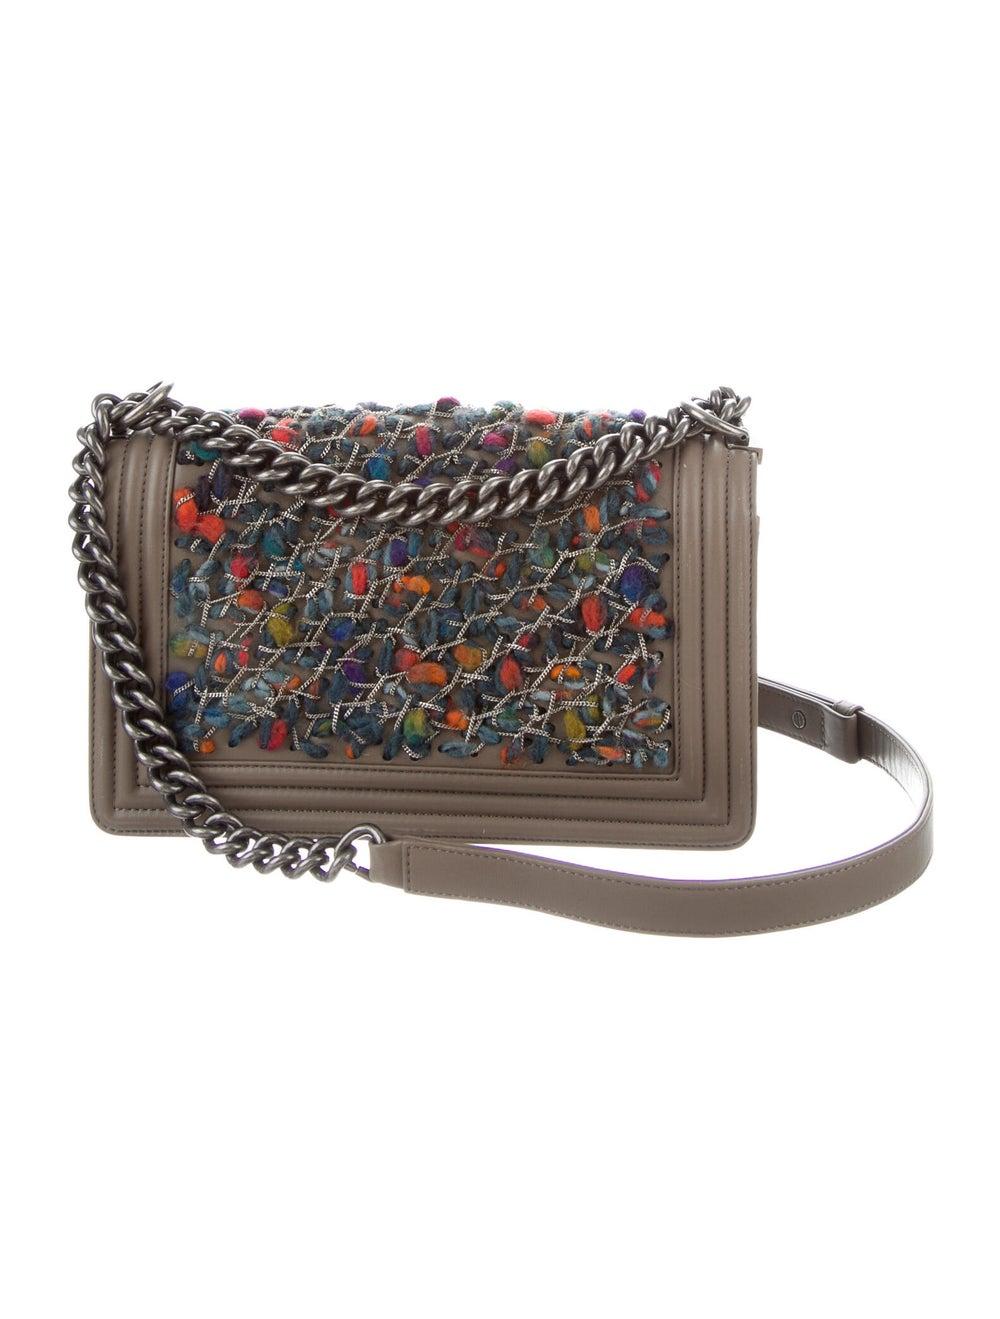 Chanel Medium Tweed Chain Boy Bag Brown - image 4